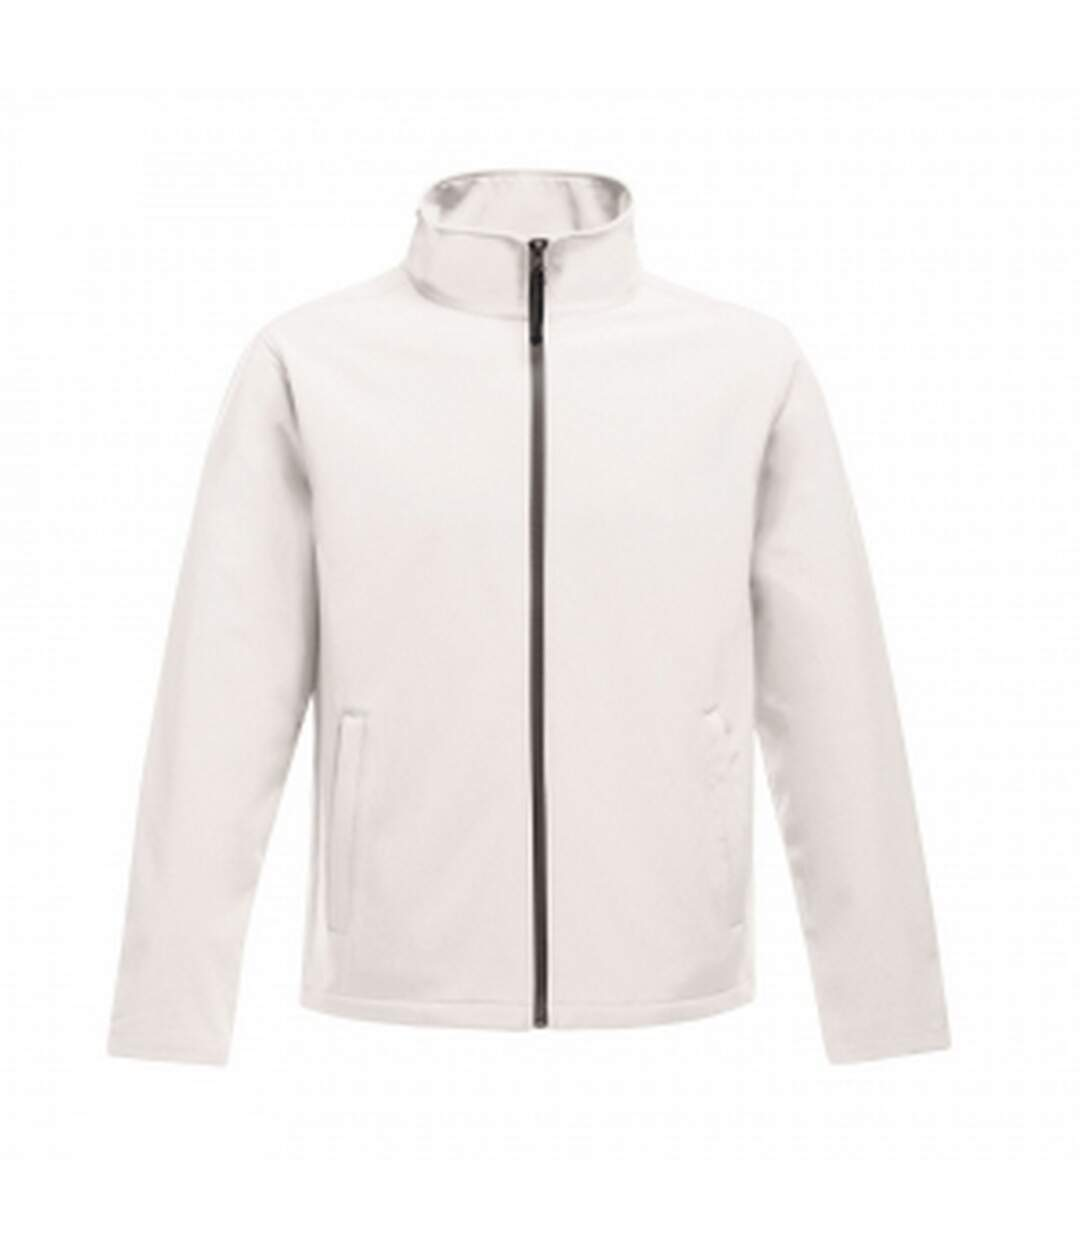 Regatta - Veste Softshell Ablaze - Homme (Blanc/gris) - UTRG3560